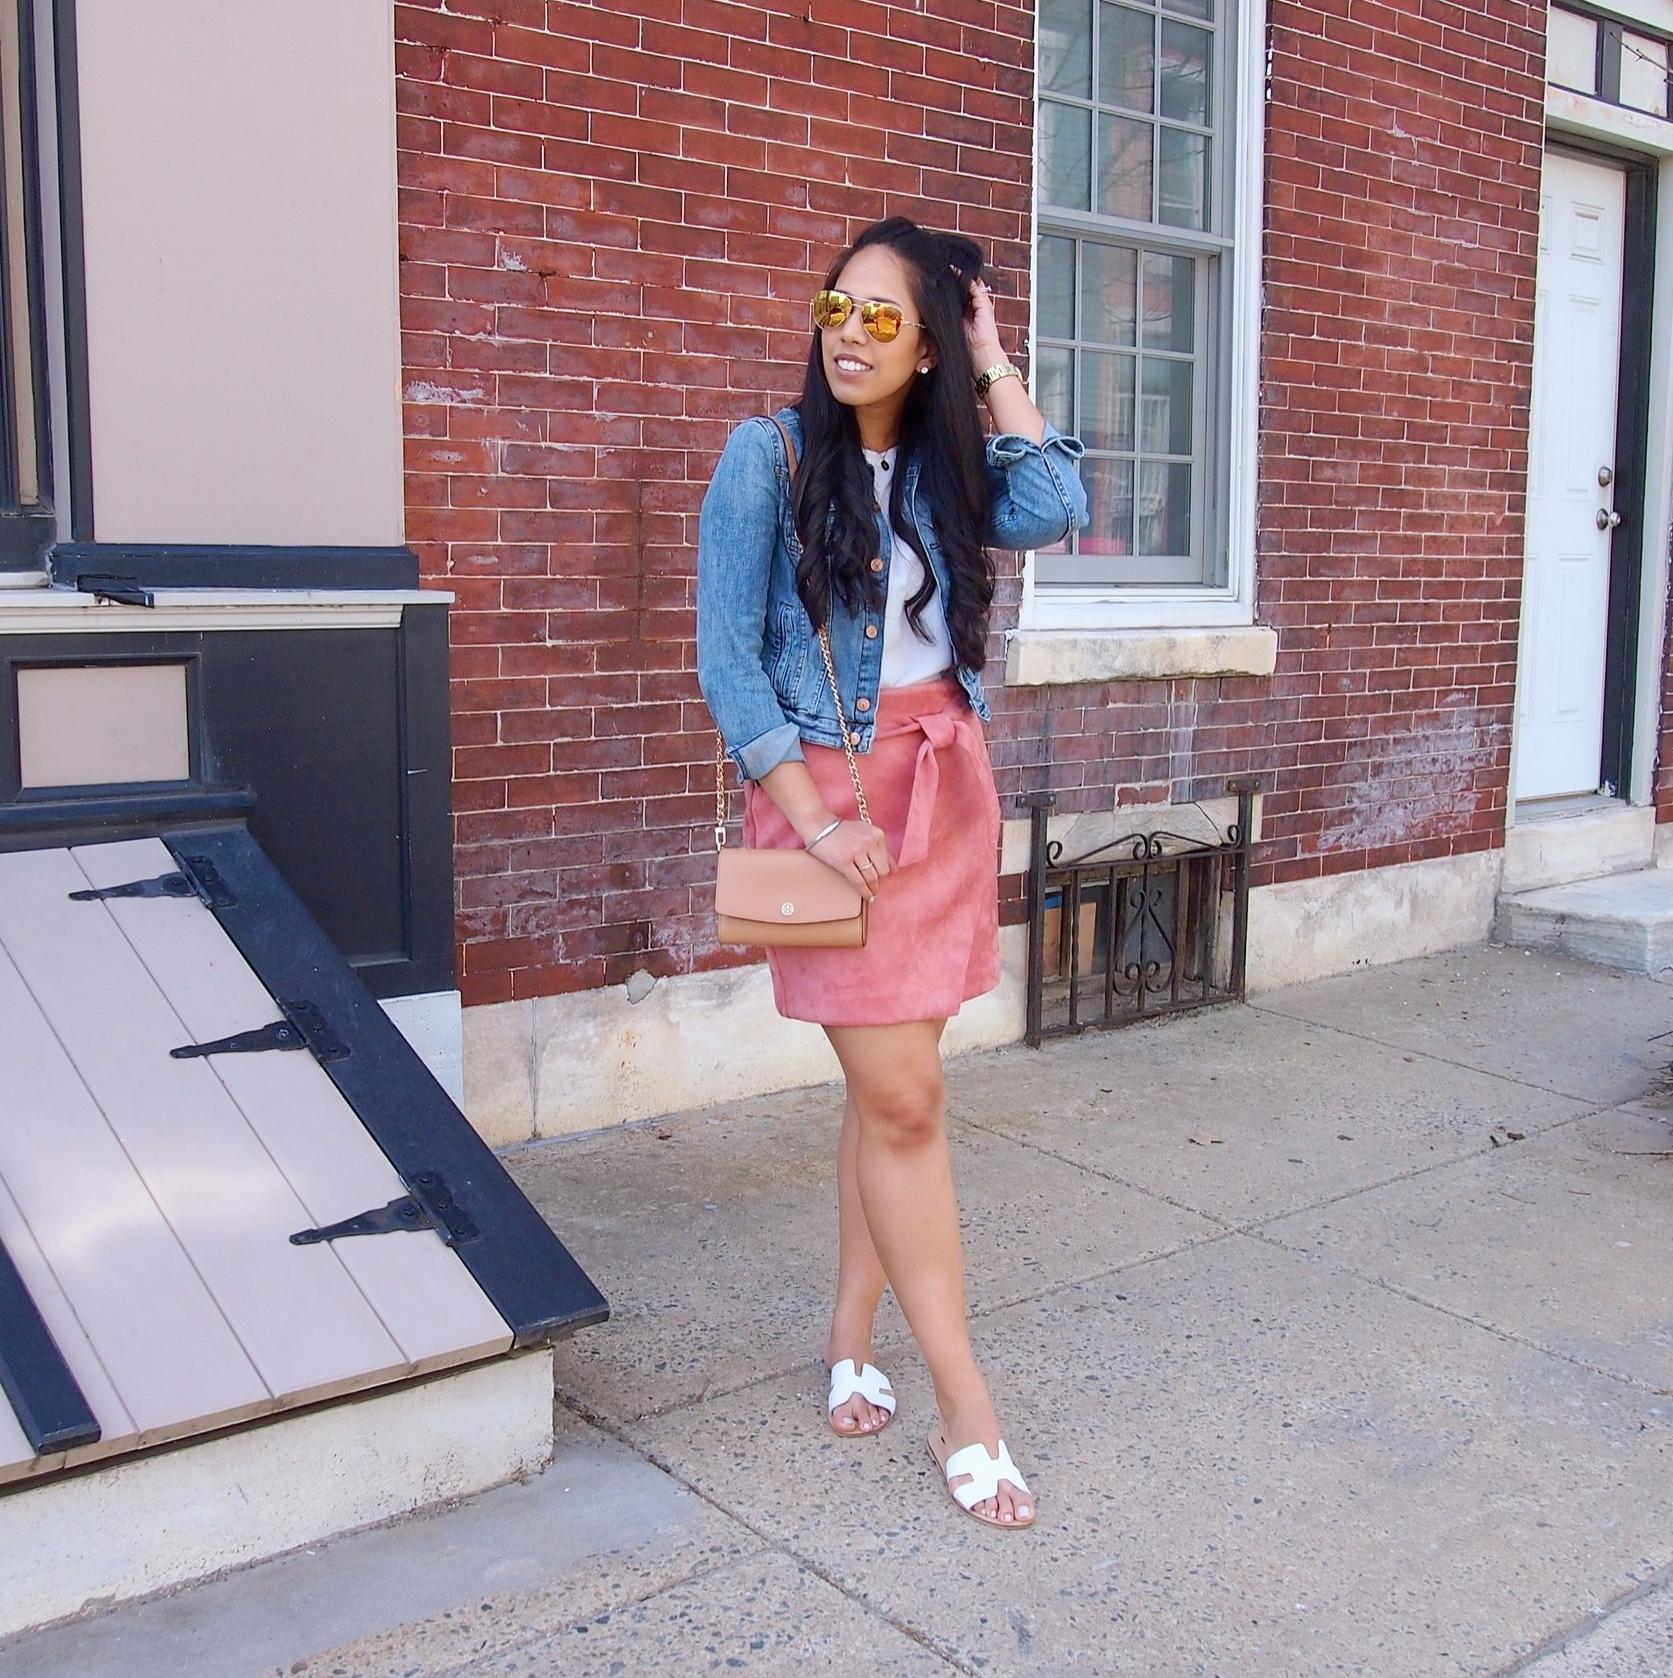 suede-skirt-spring-fashion-fashion-blog-mygoldenbeauty.JPG